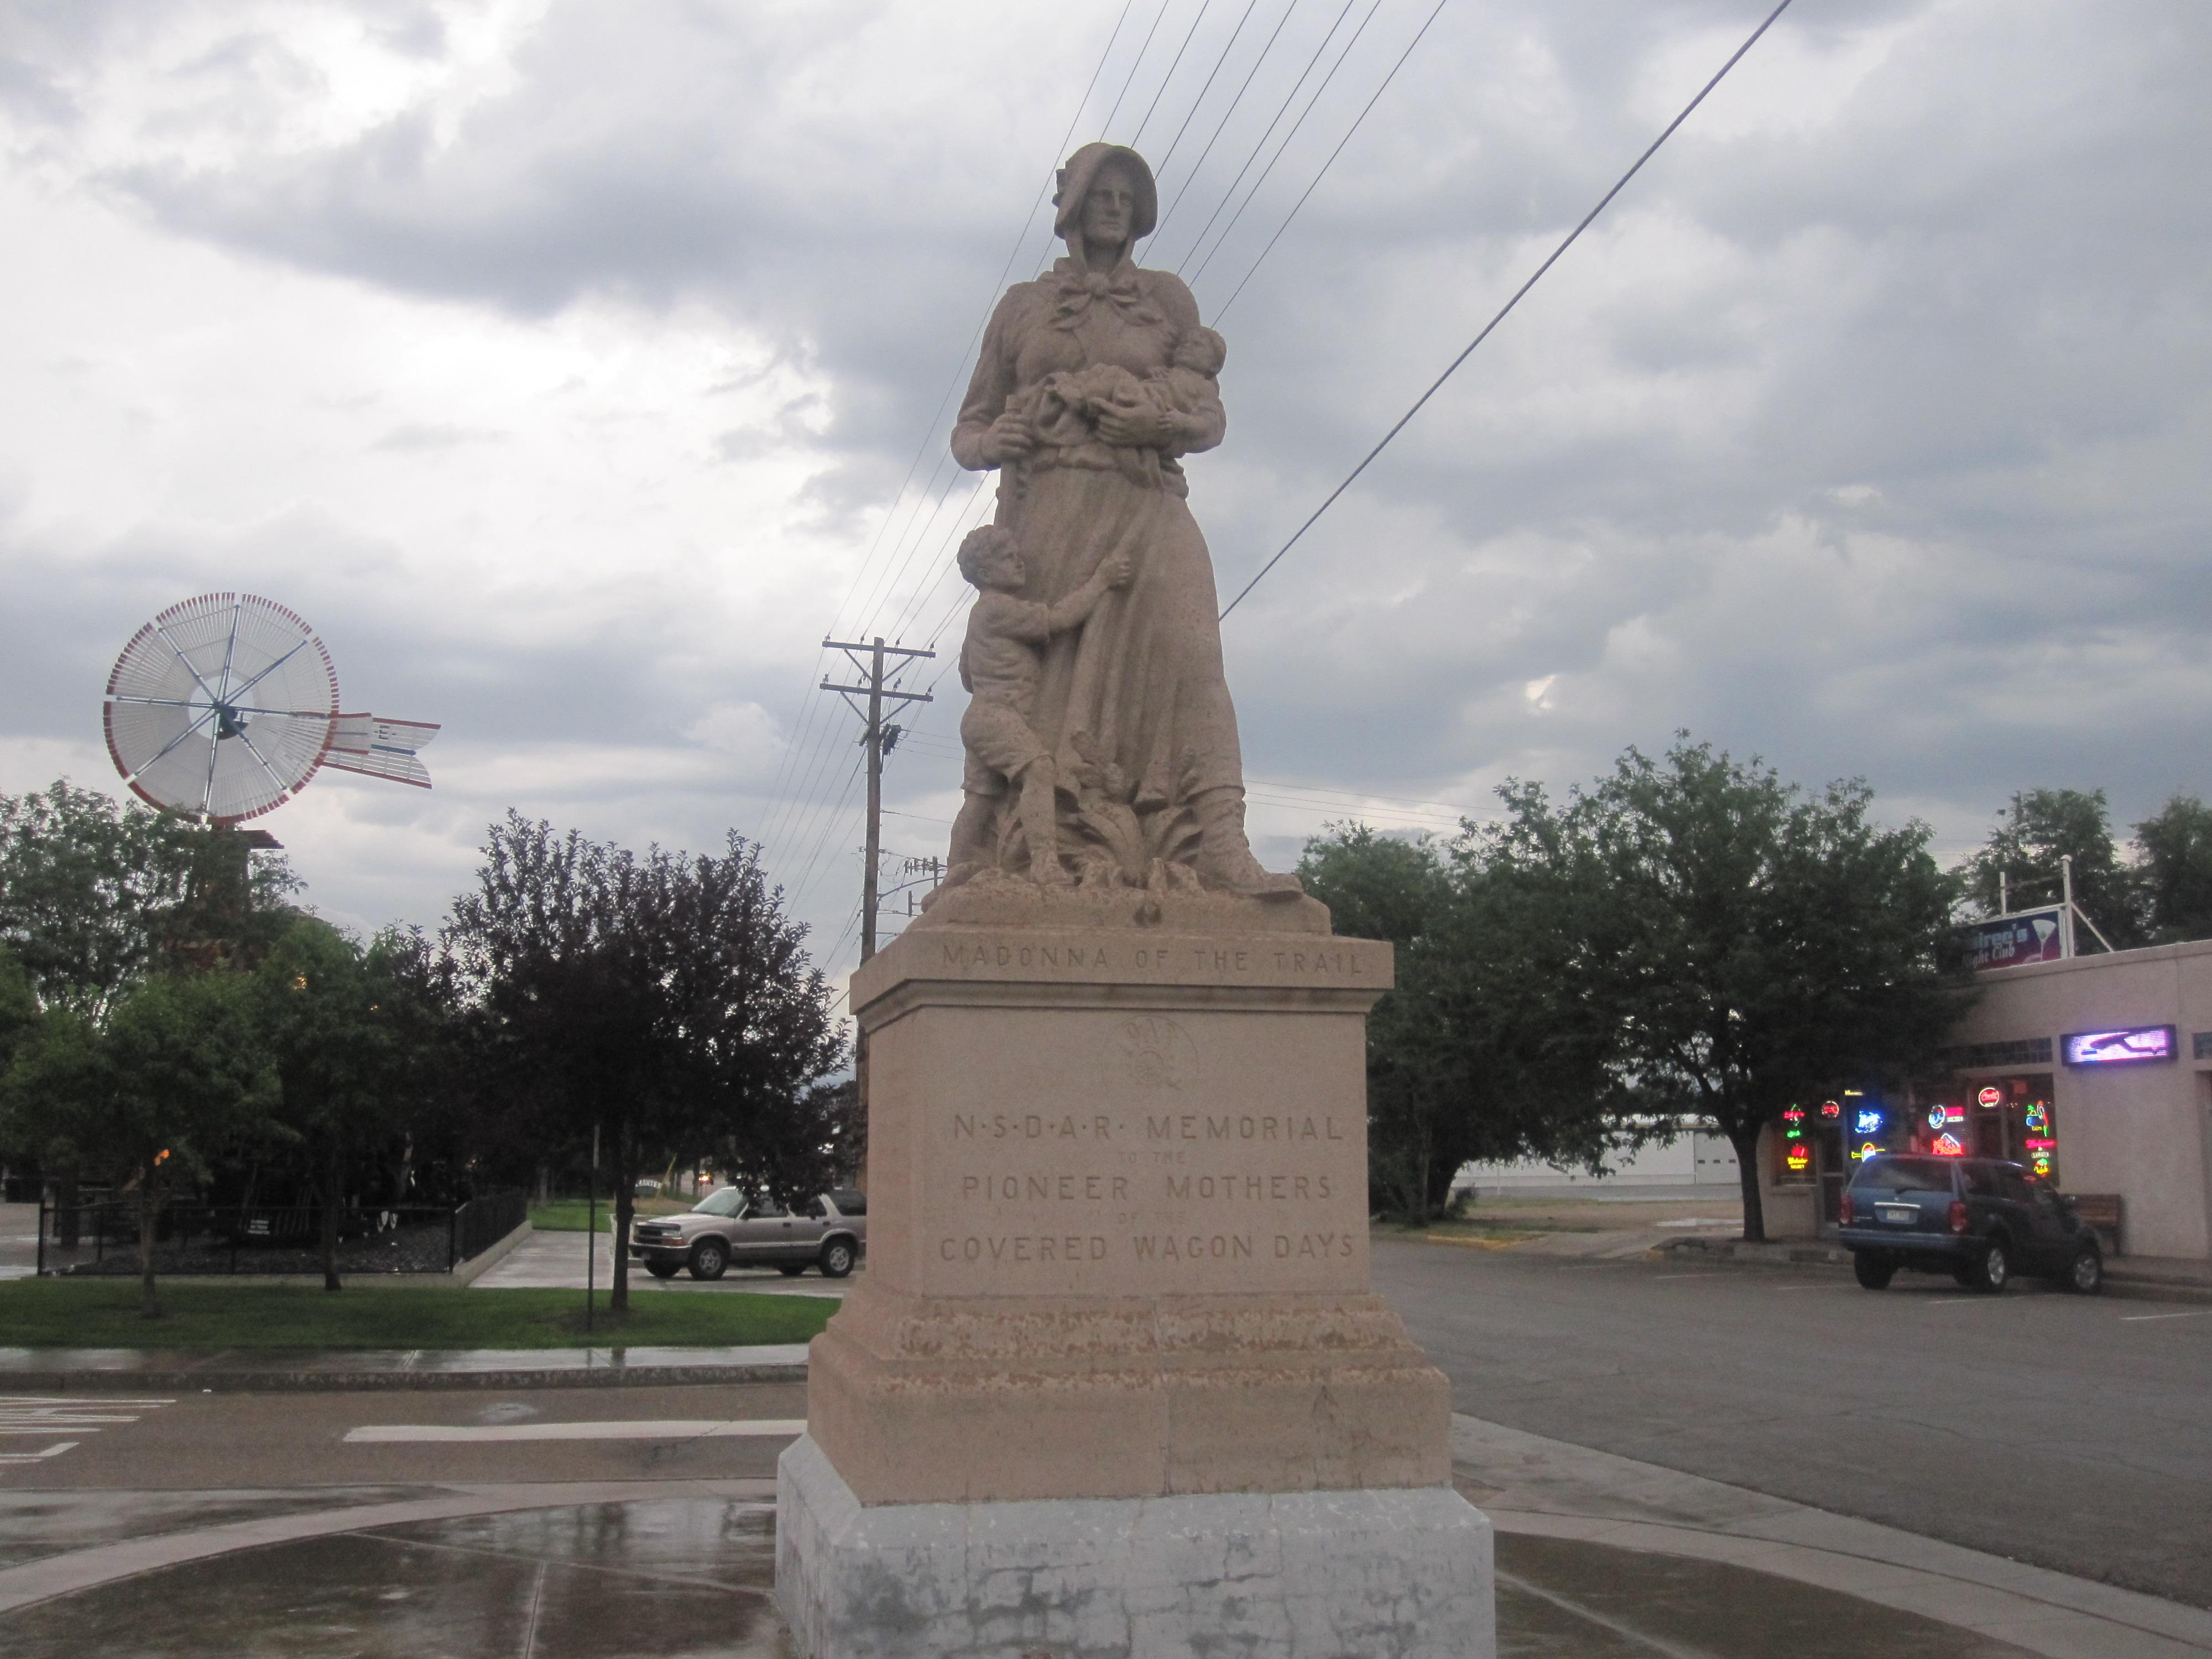 File:Madonna of the Trail, Lamar, CO IMG 5743.JPG - Wikimedia Commonsbalance of lamar county